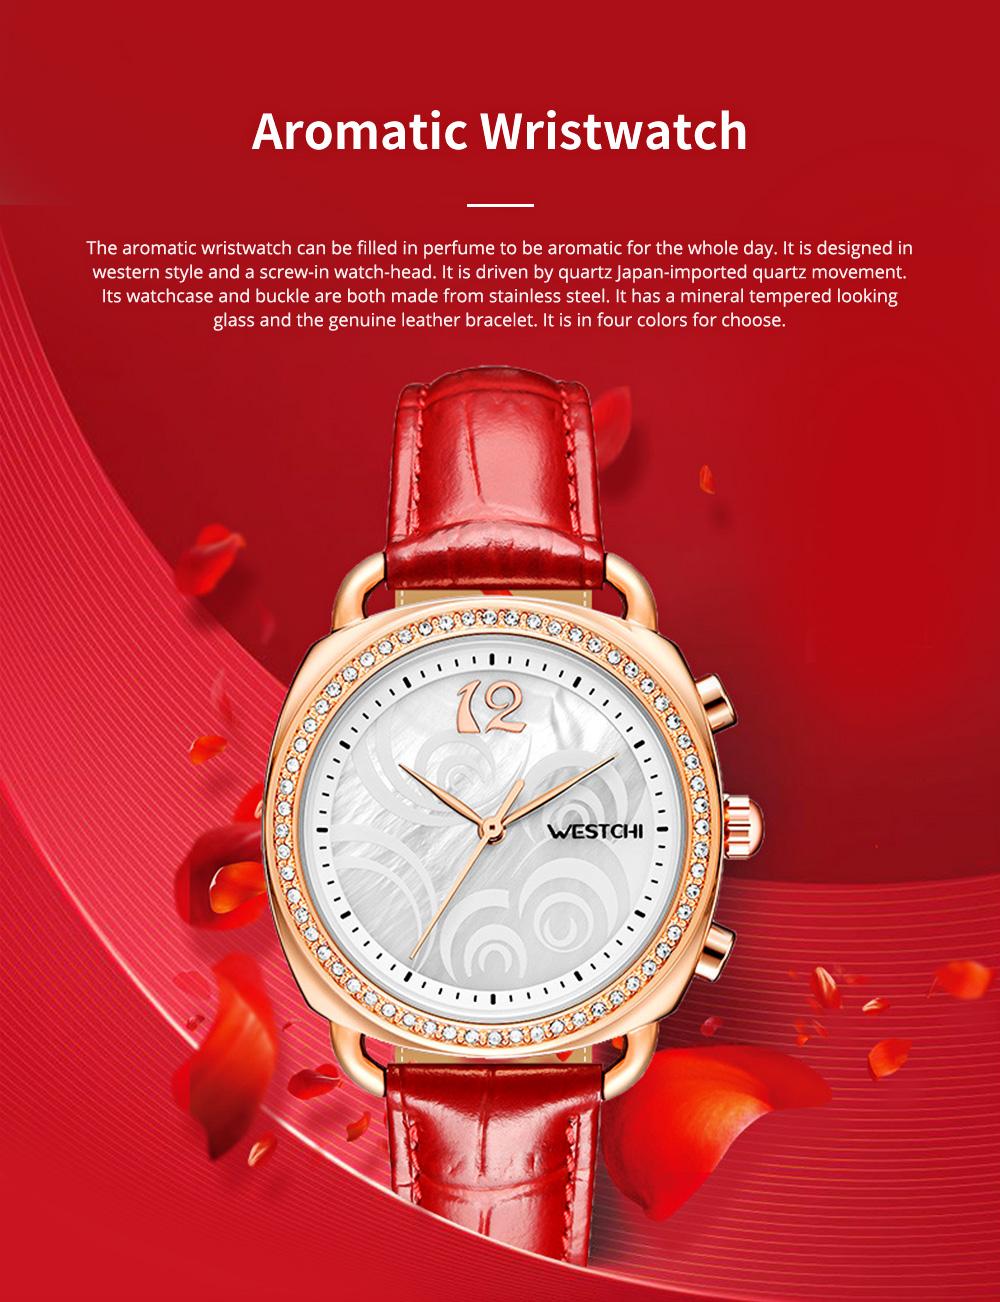 Fashionable Women's Wristwatch with Perfume Smell Screw-in Watch-head Wear Resistant Leather Miyota Quartz Watch 0